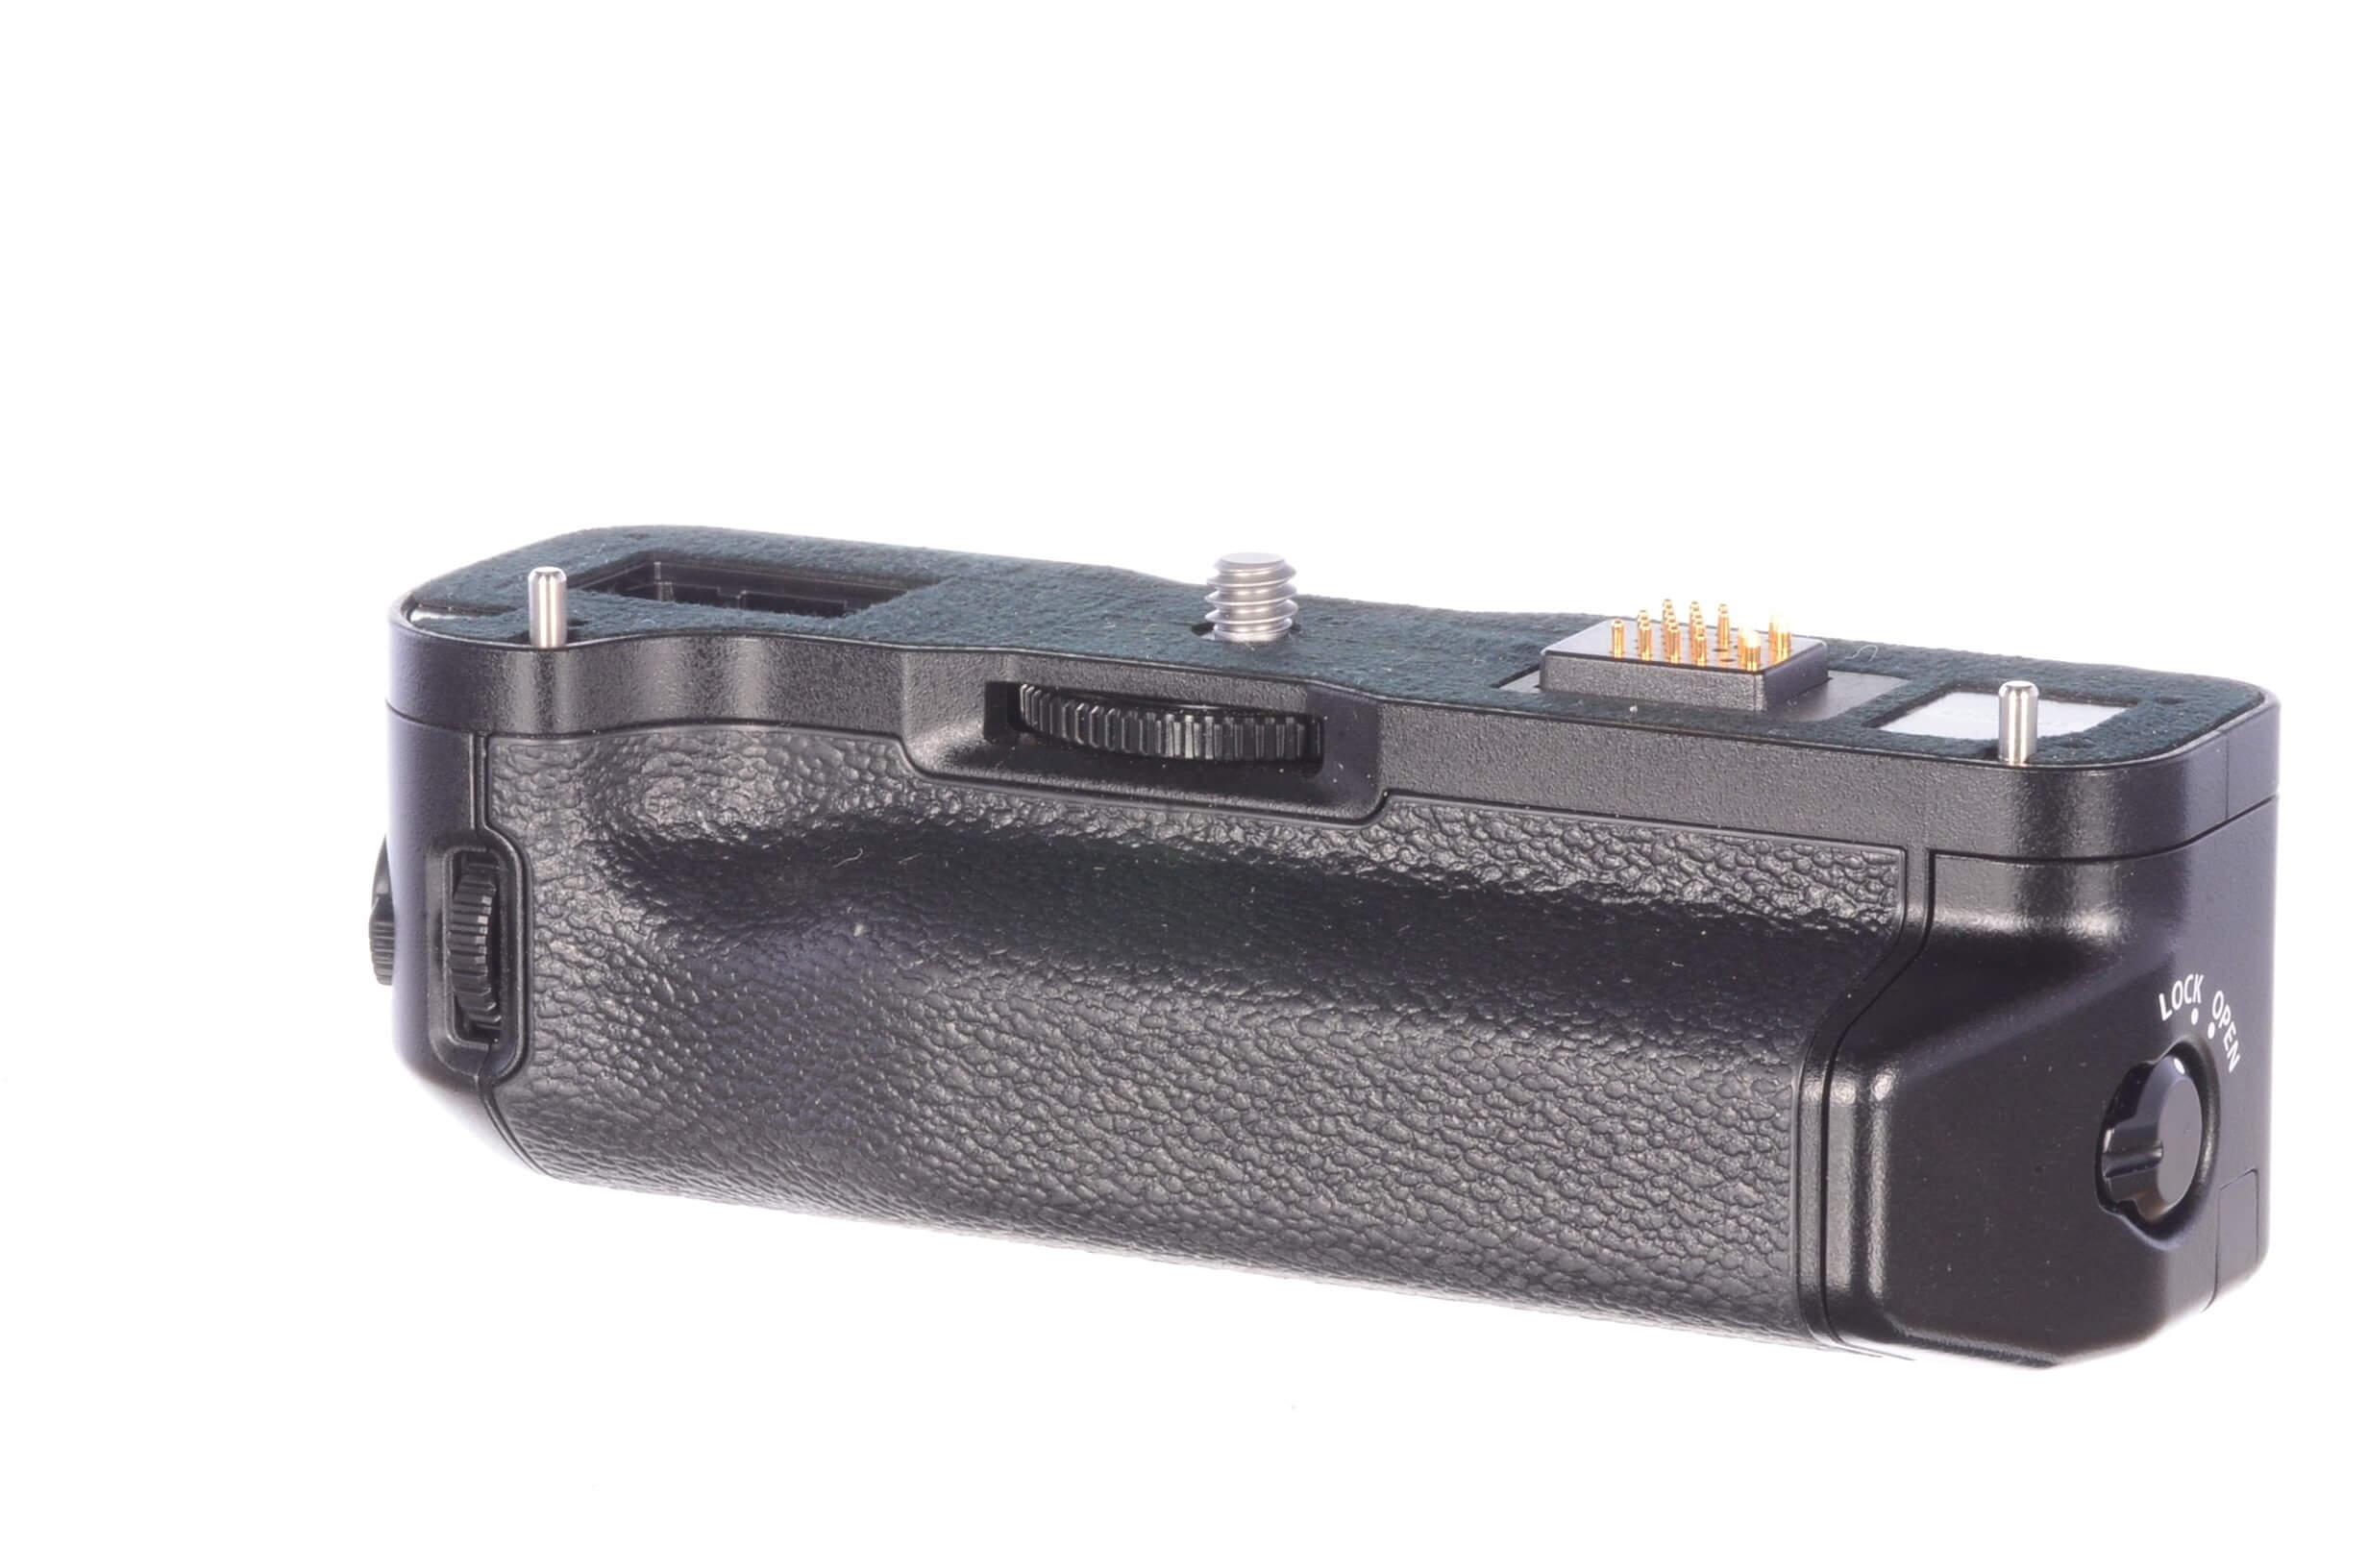 Fuji Vertical Battery Grip VG-XT1, almost mint